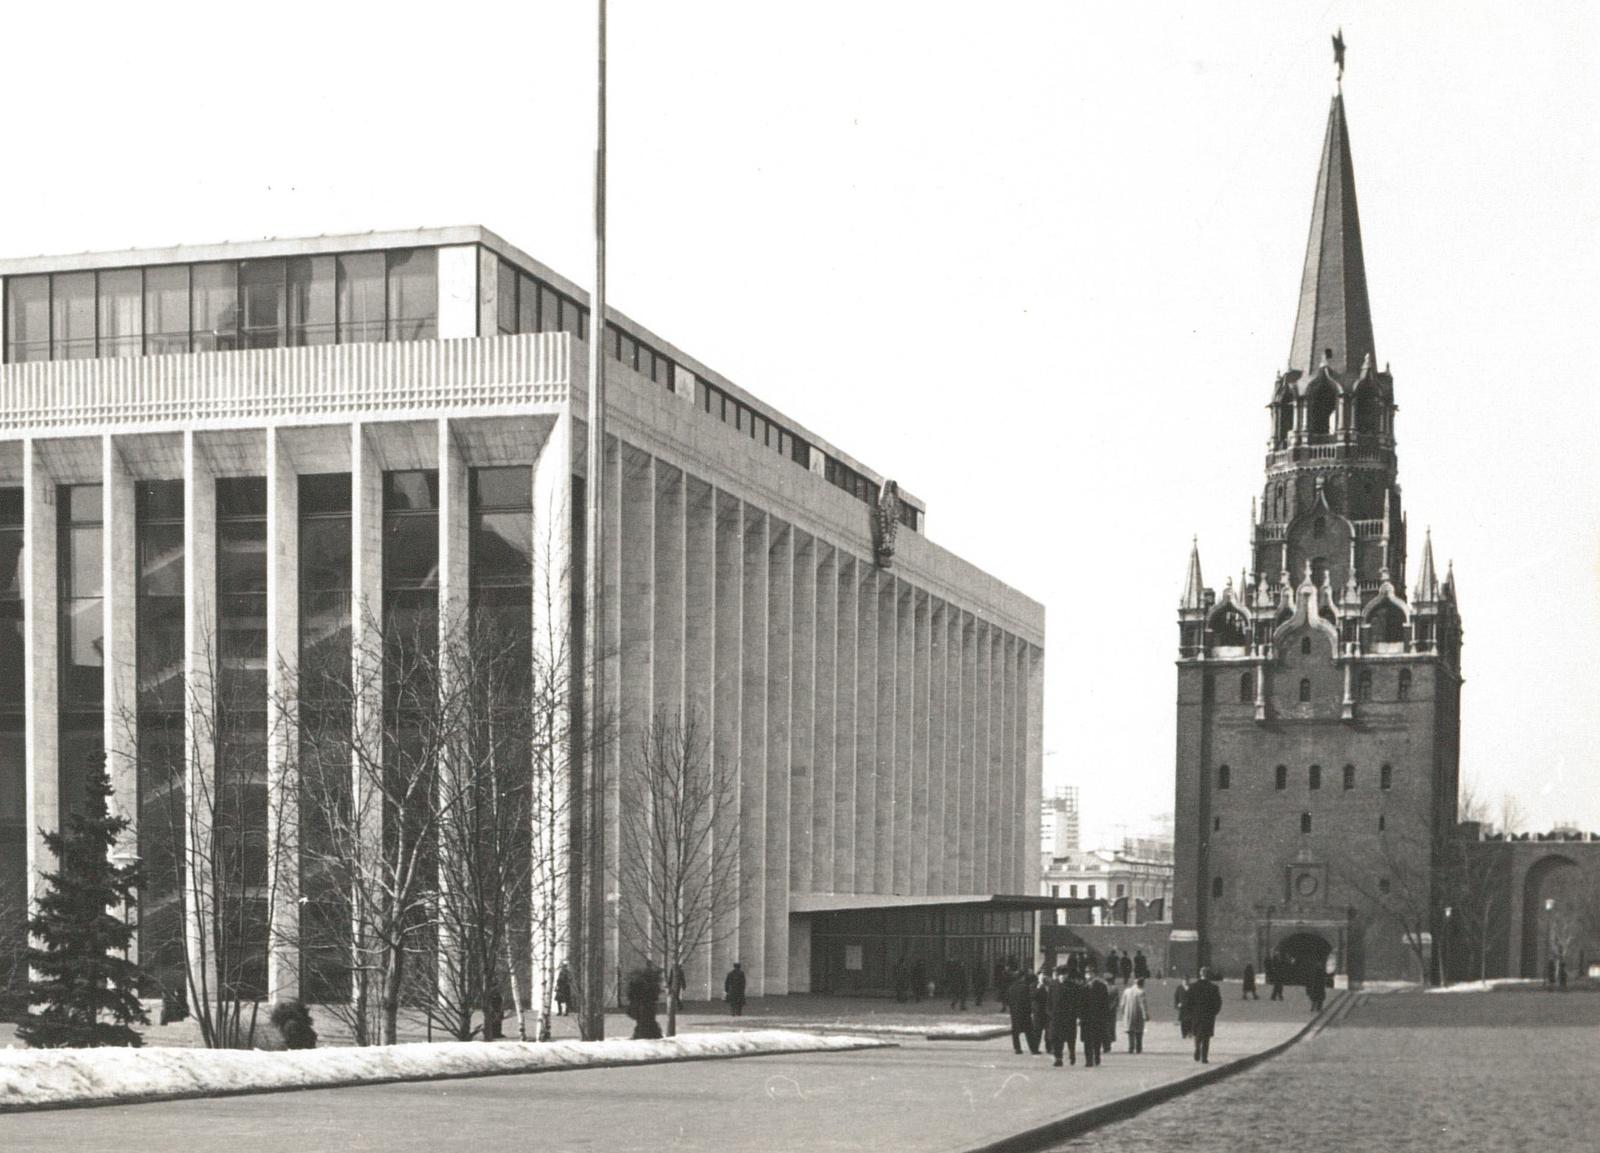 Москва. Кремль. Дворец съездов. 1967